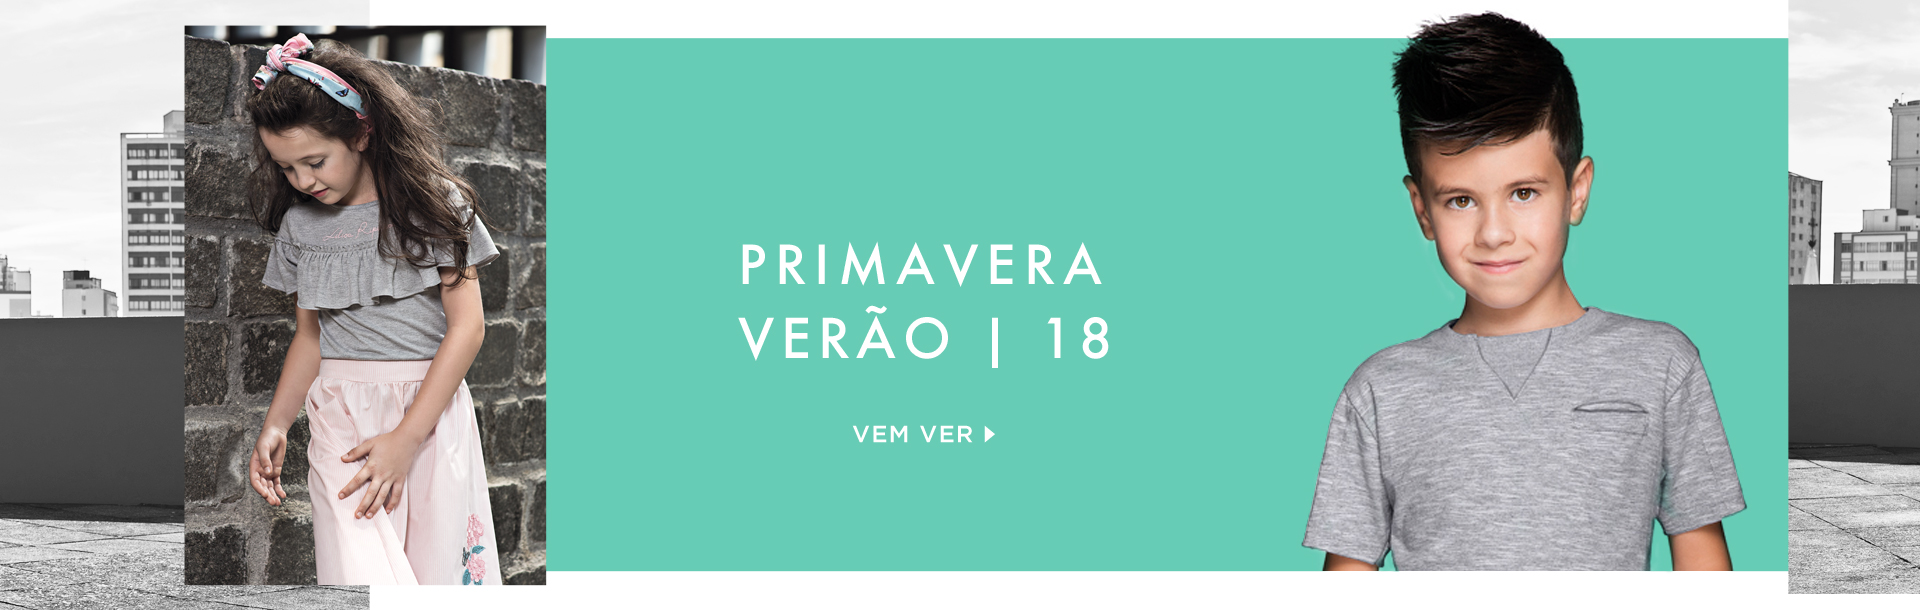 Banner Principal 03